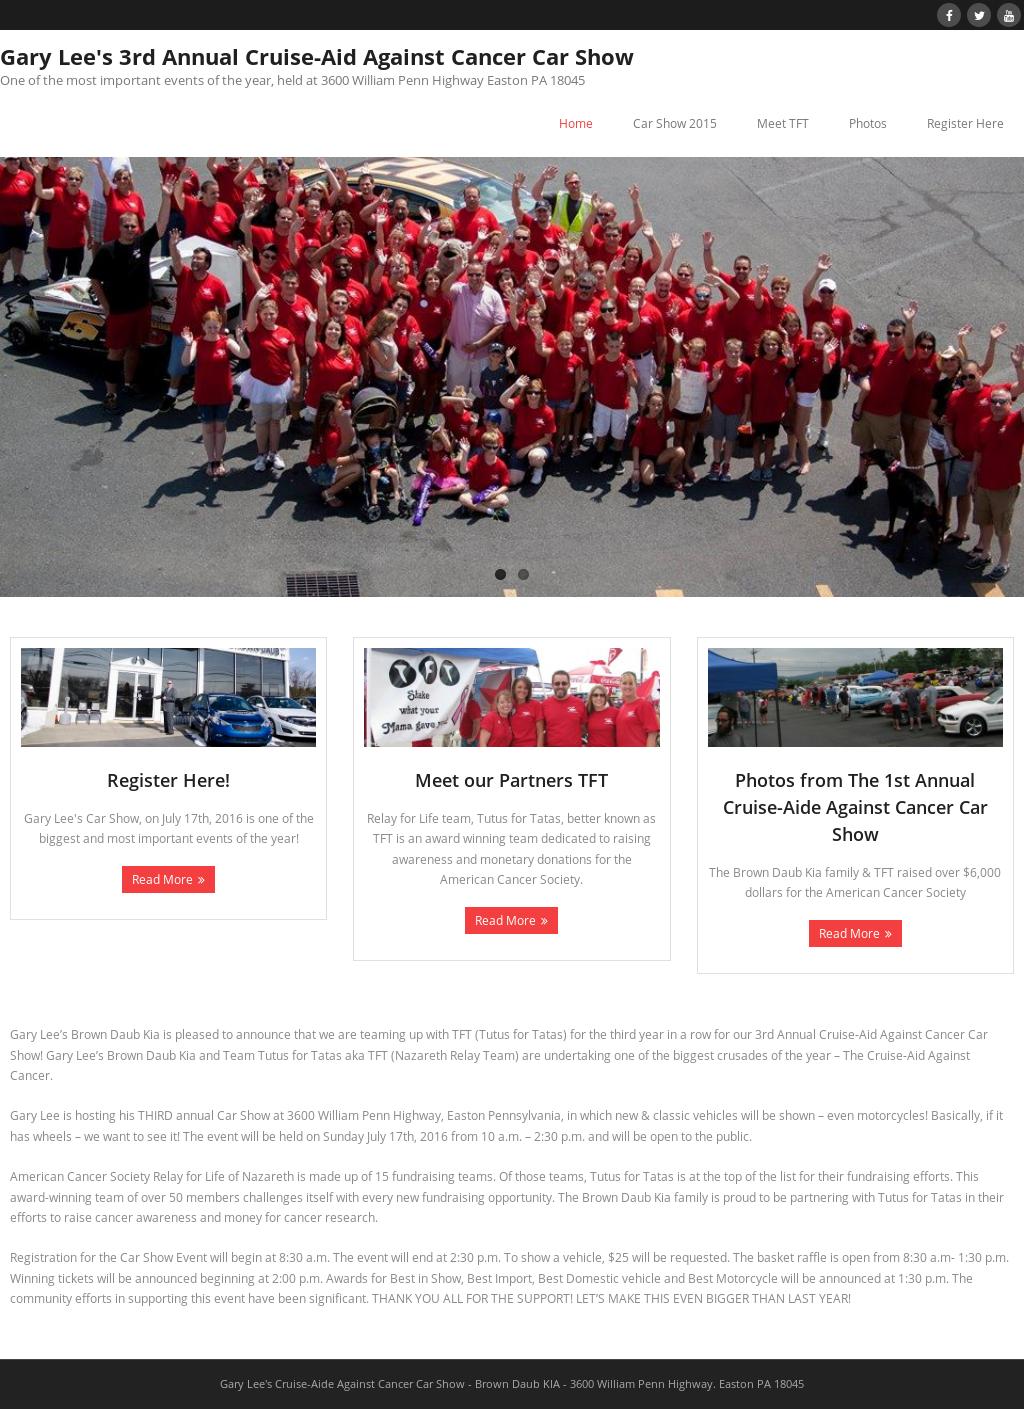 Brown Daub Kia Competitors, Revenue And Employees   Owler Company Profile